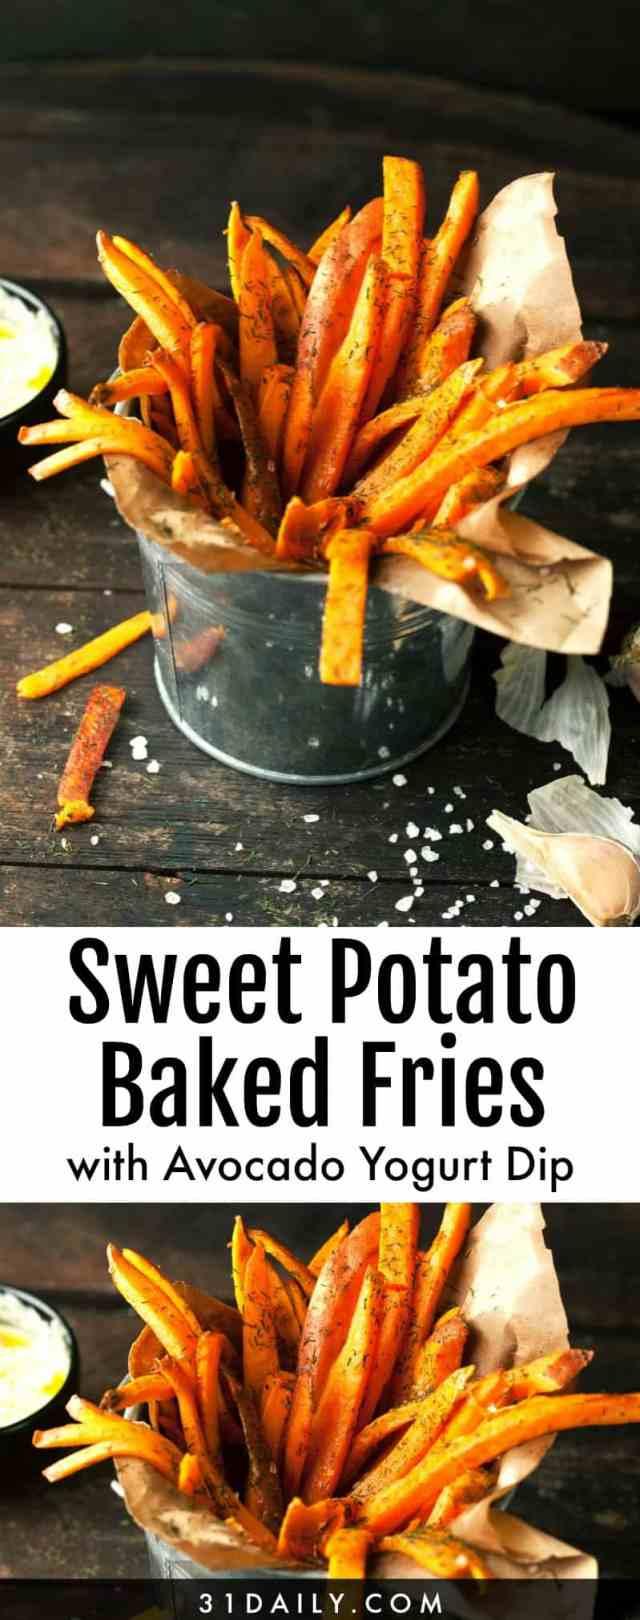 Baked Sweet Potato Fries with Avocado Greek Yogurt Dip   31Daily.com